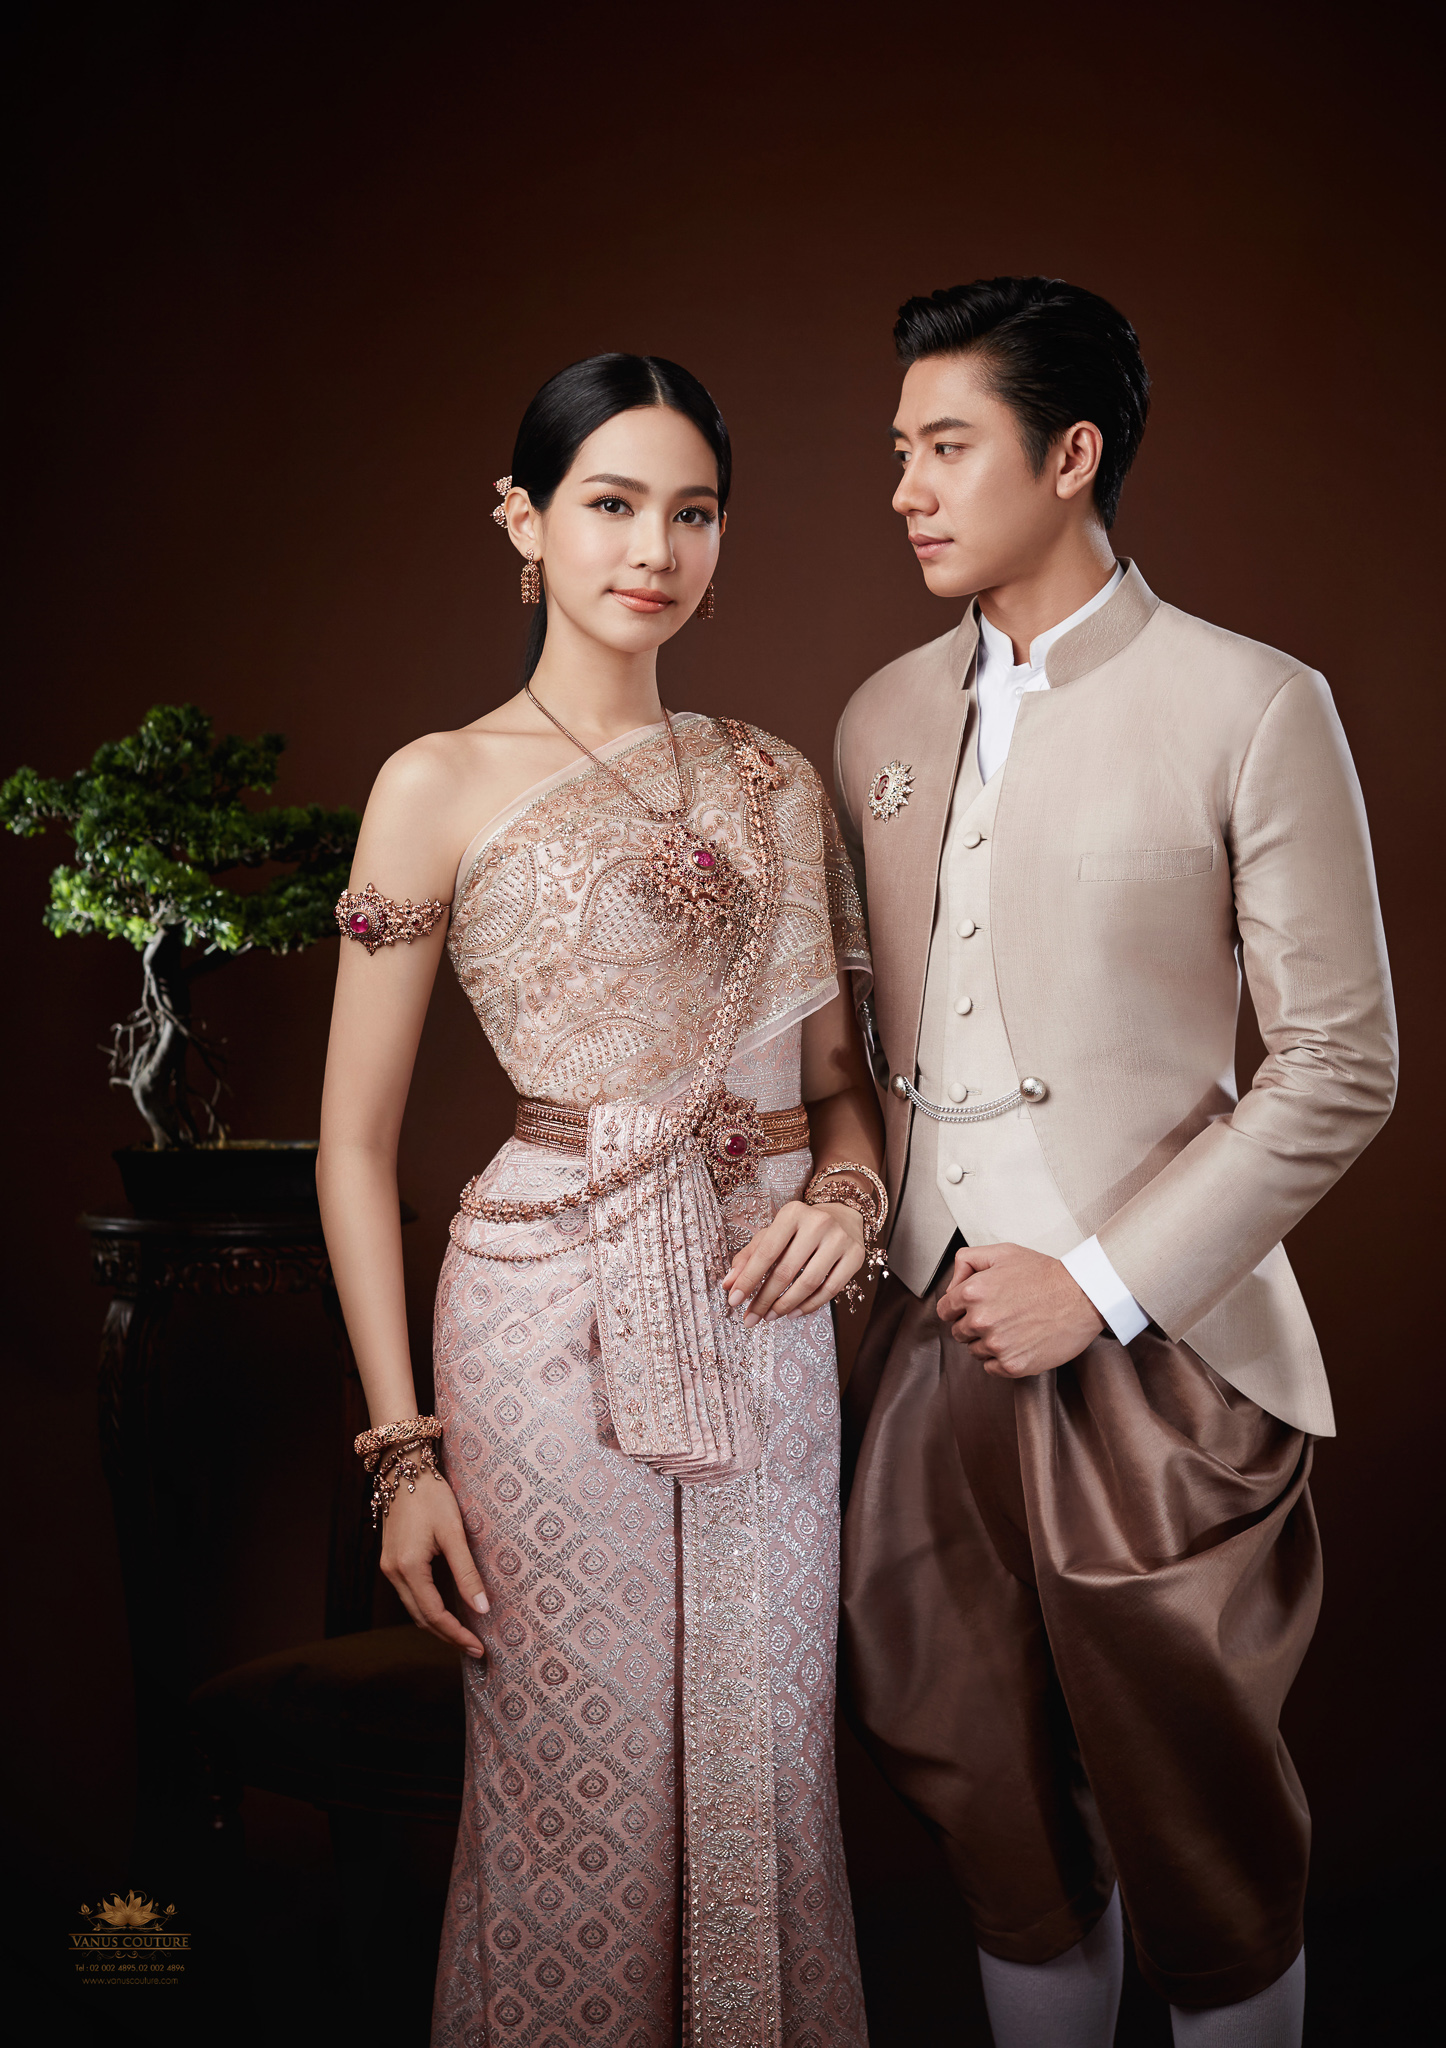 Thai traditional dress - Bint 06